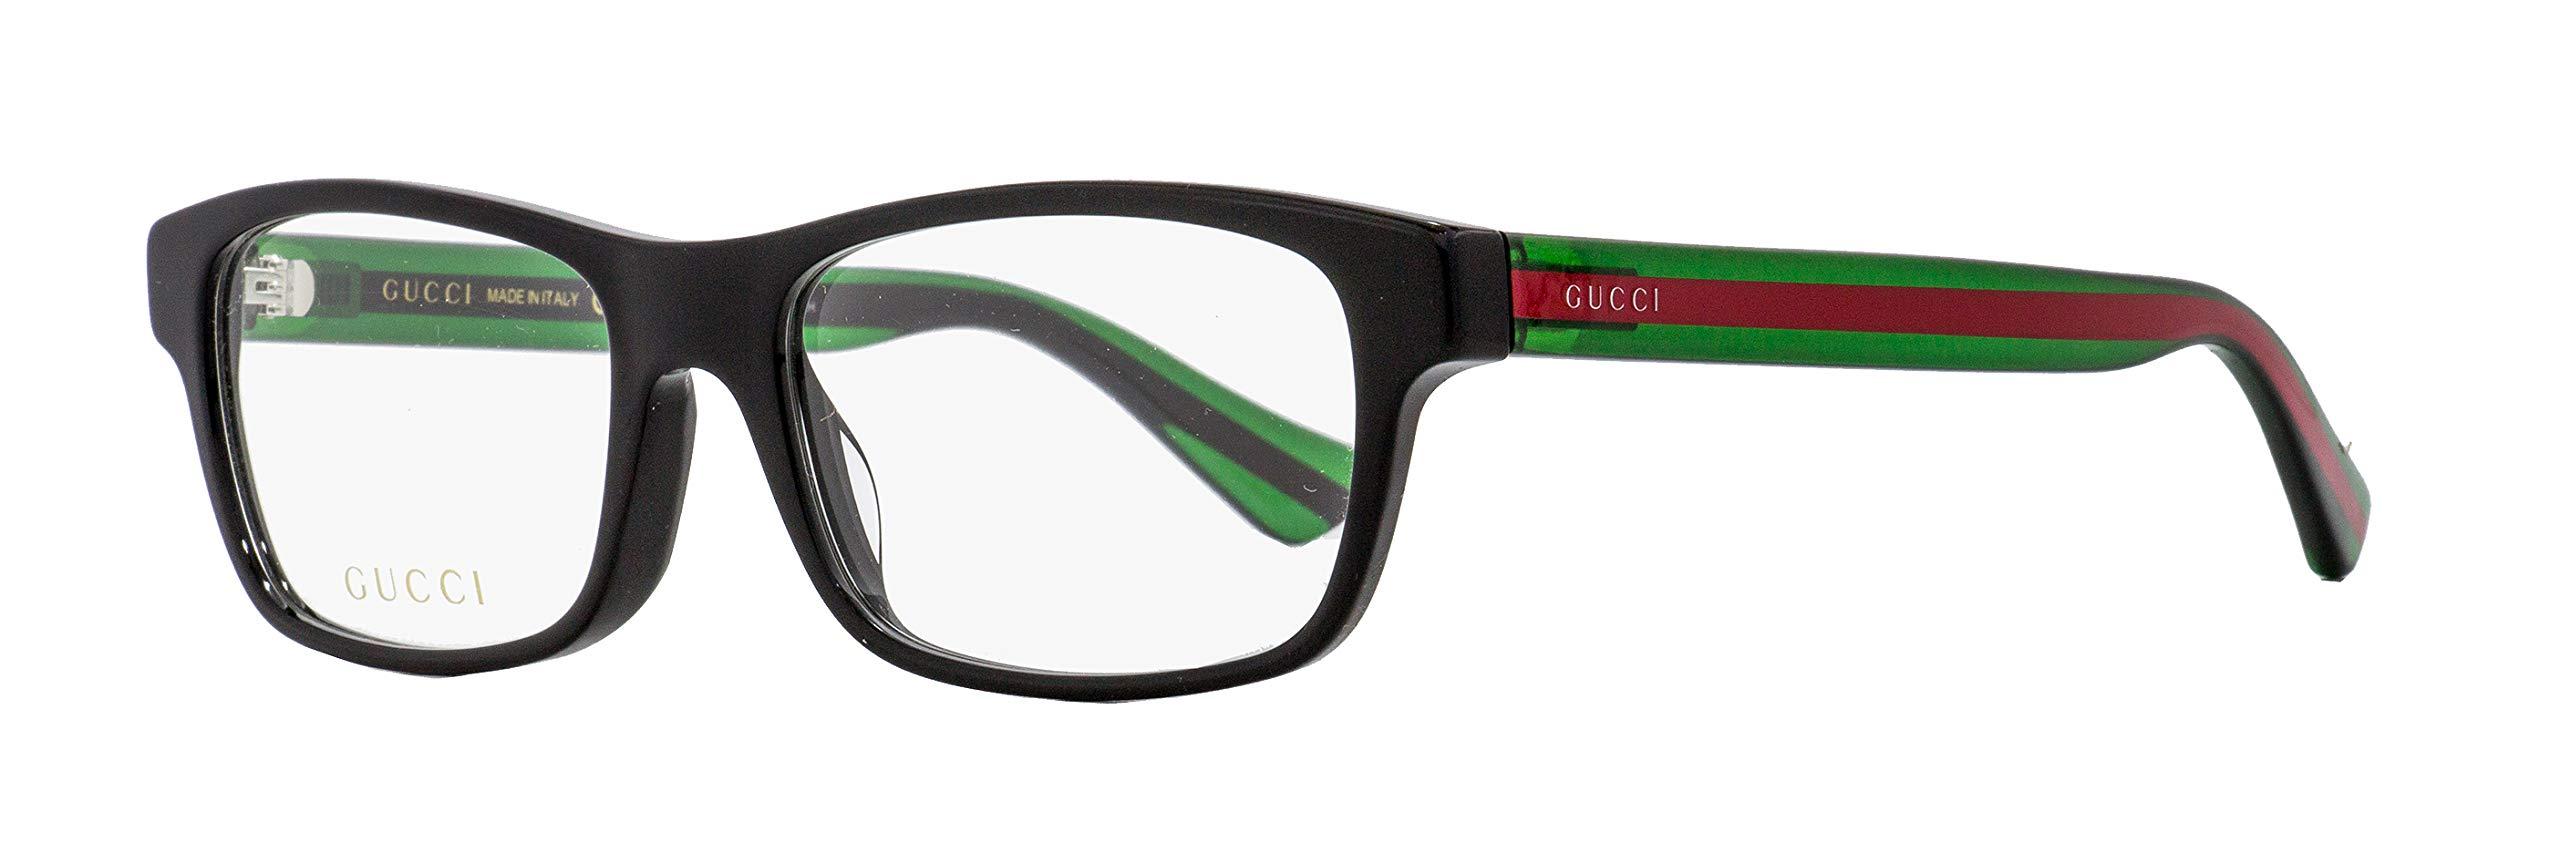 Gucci GG 0006O 006 Black/Green Plastic Rectangle Eyeglasses 55mm by Gucci